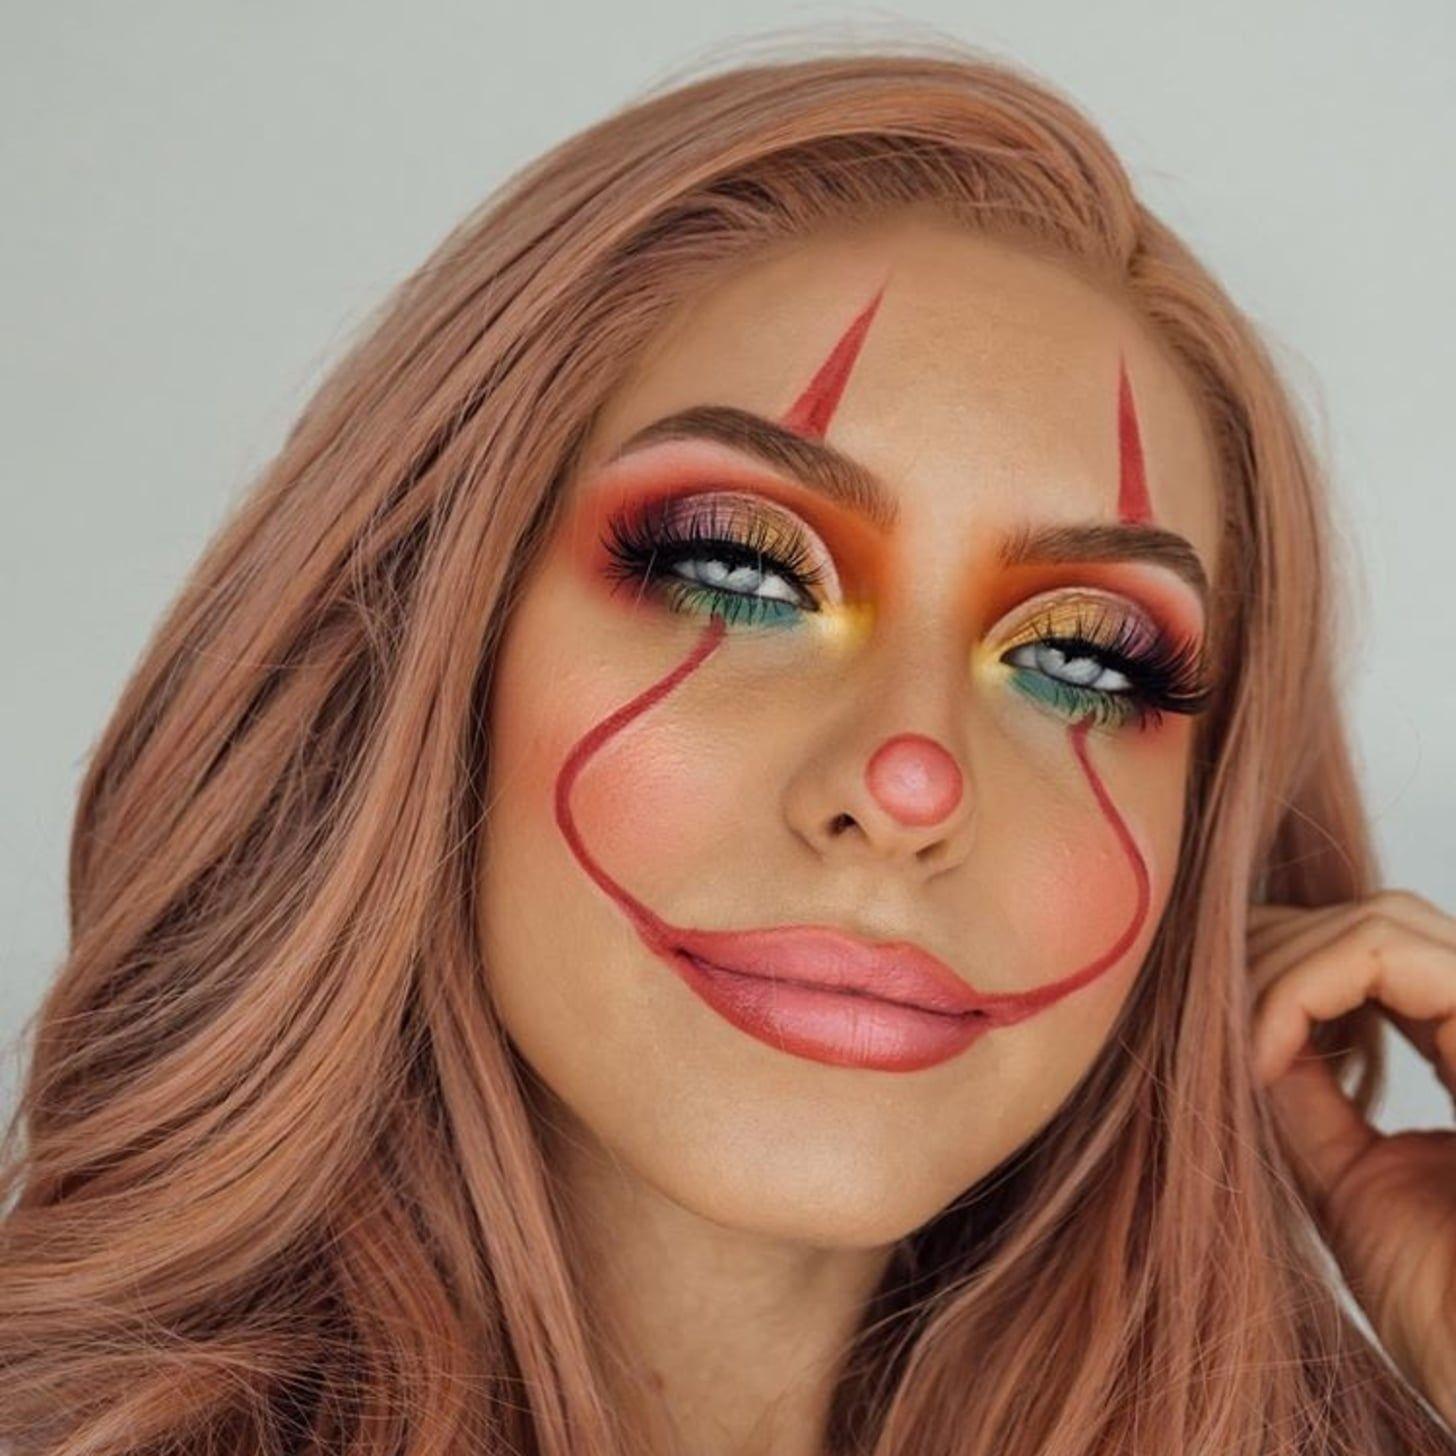 Pretty Clown Halloween Makeup Is Trending on Pinterest